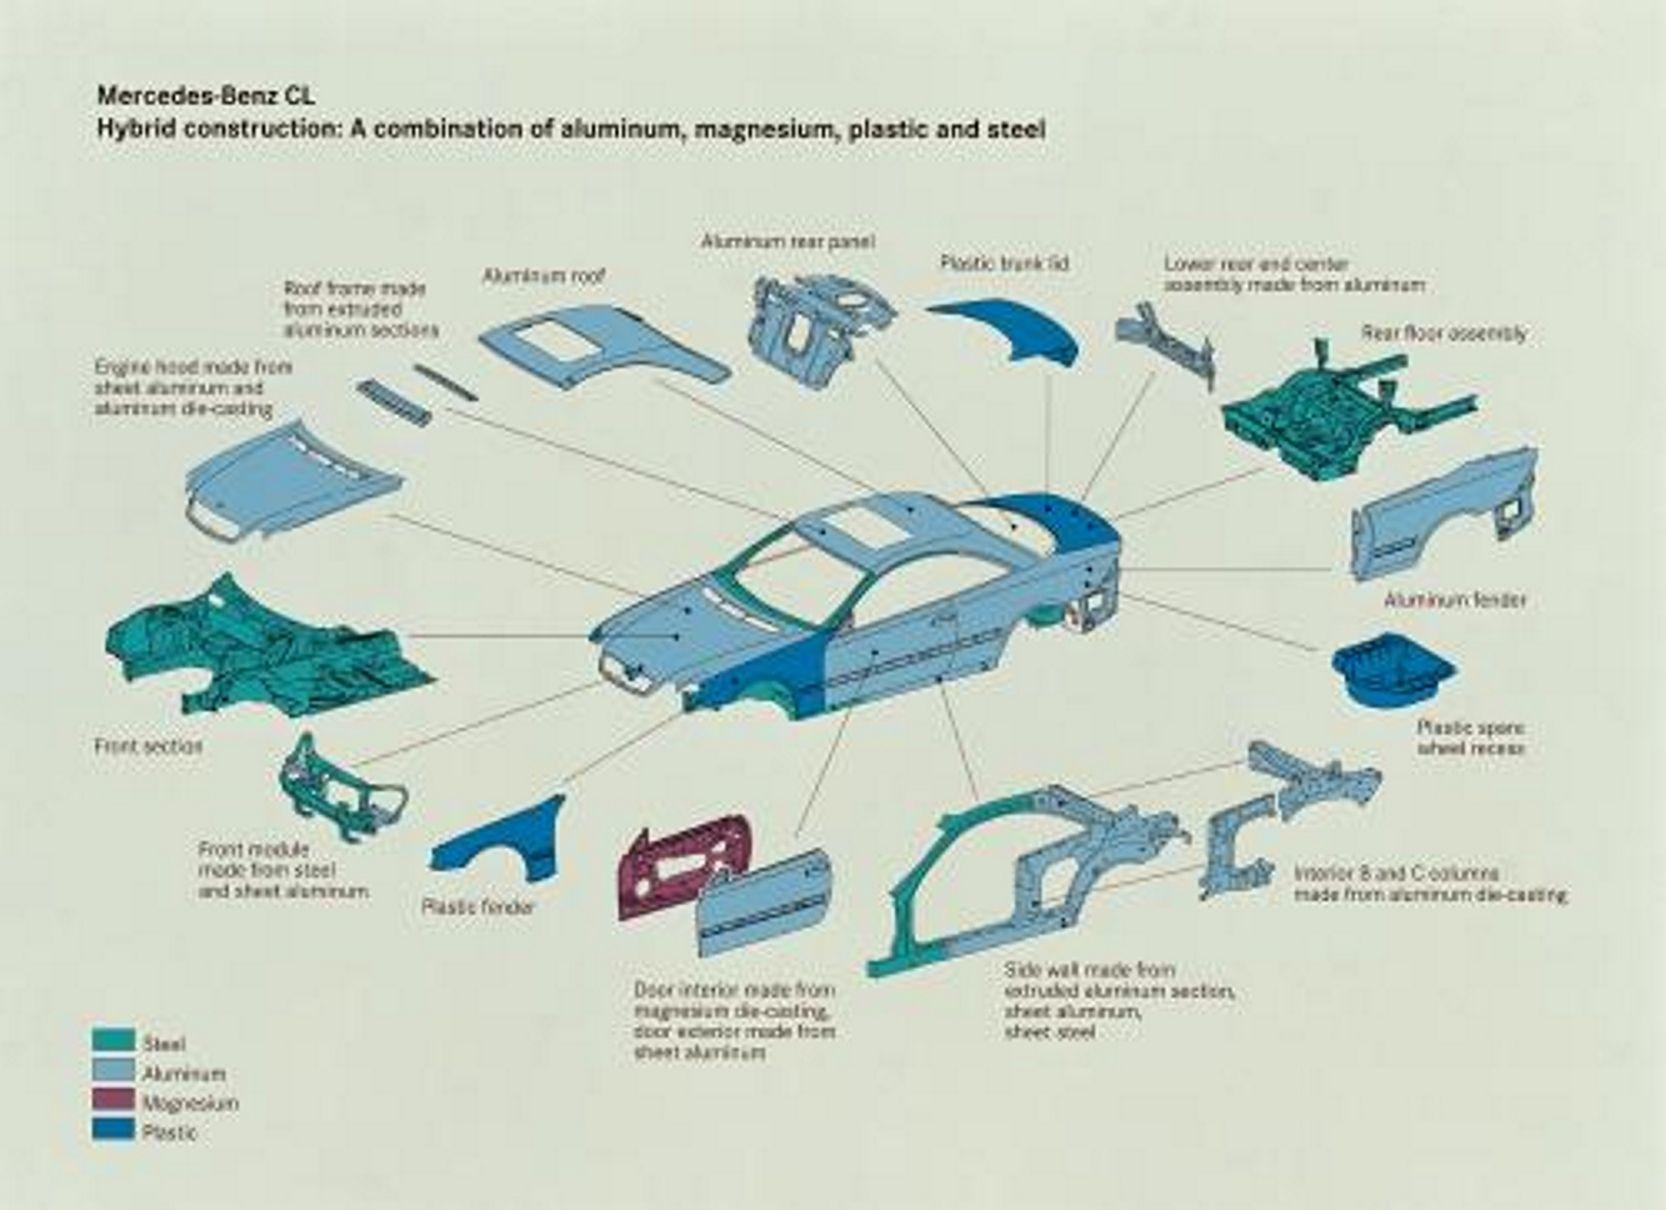 AA-Academy : Training - BSI Kitemark Scheme for Vehicle Body Repair ...